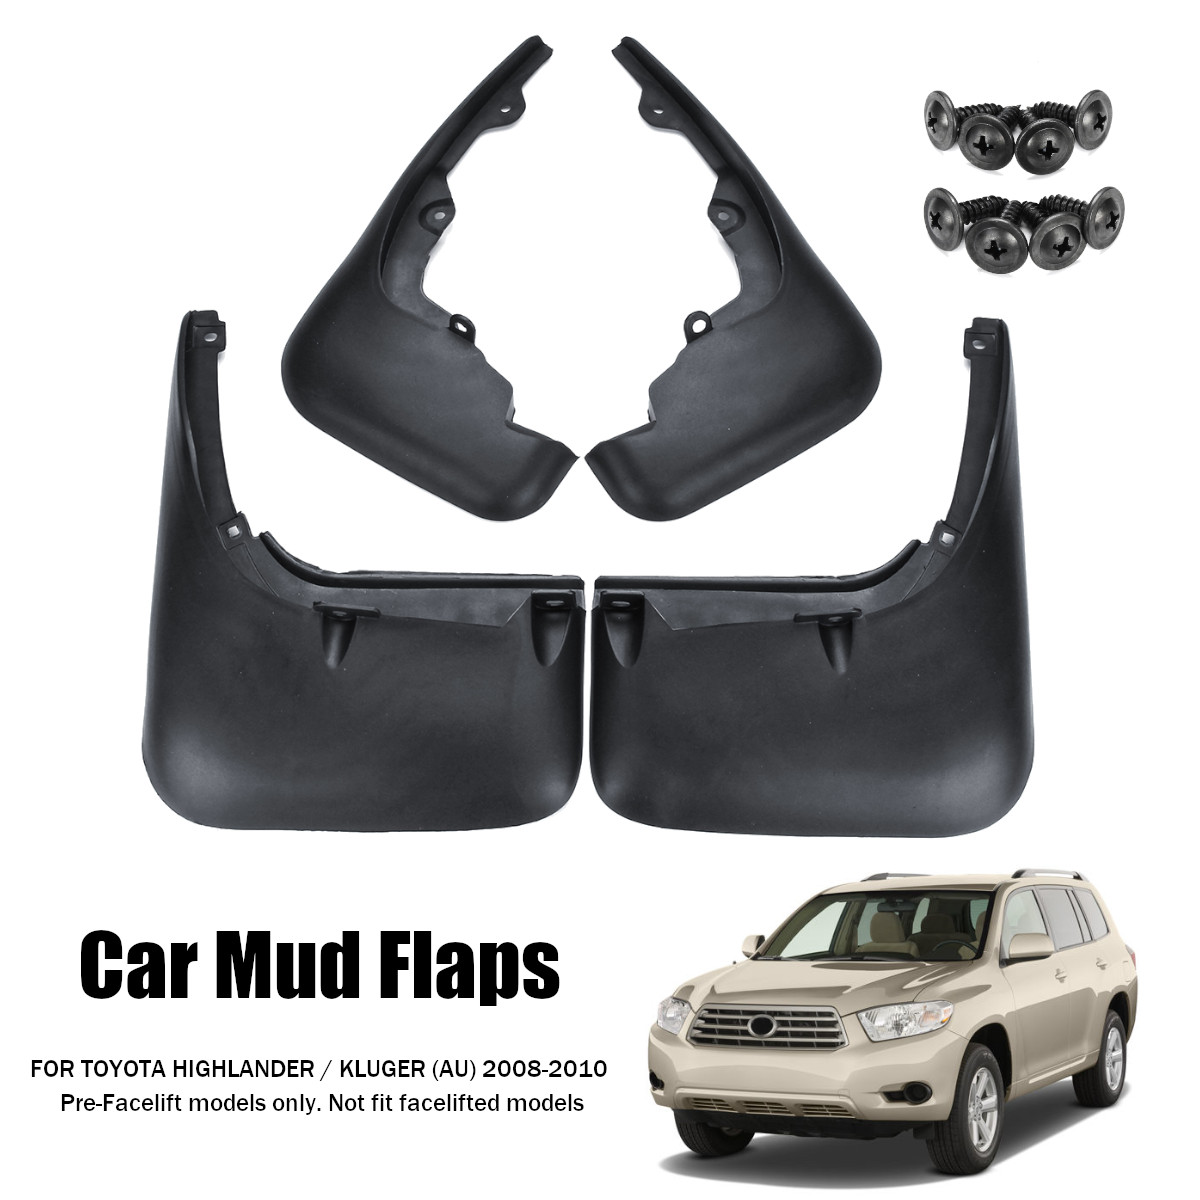 4x For Toyota Highlander XU50 2014-2018 Mud Flaps Splash Guards Mudguards Fender